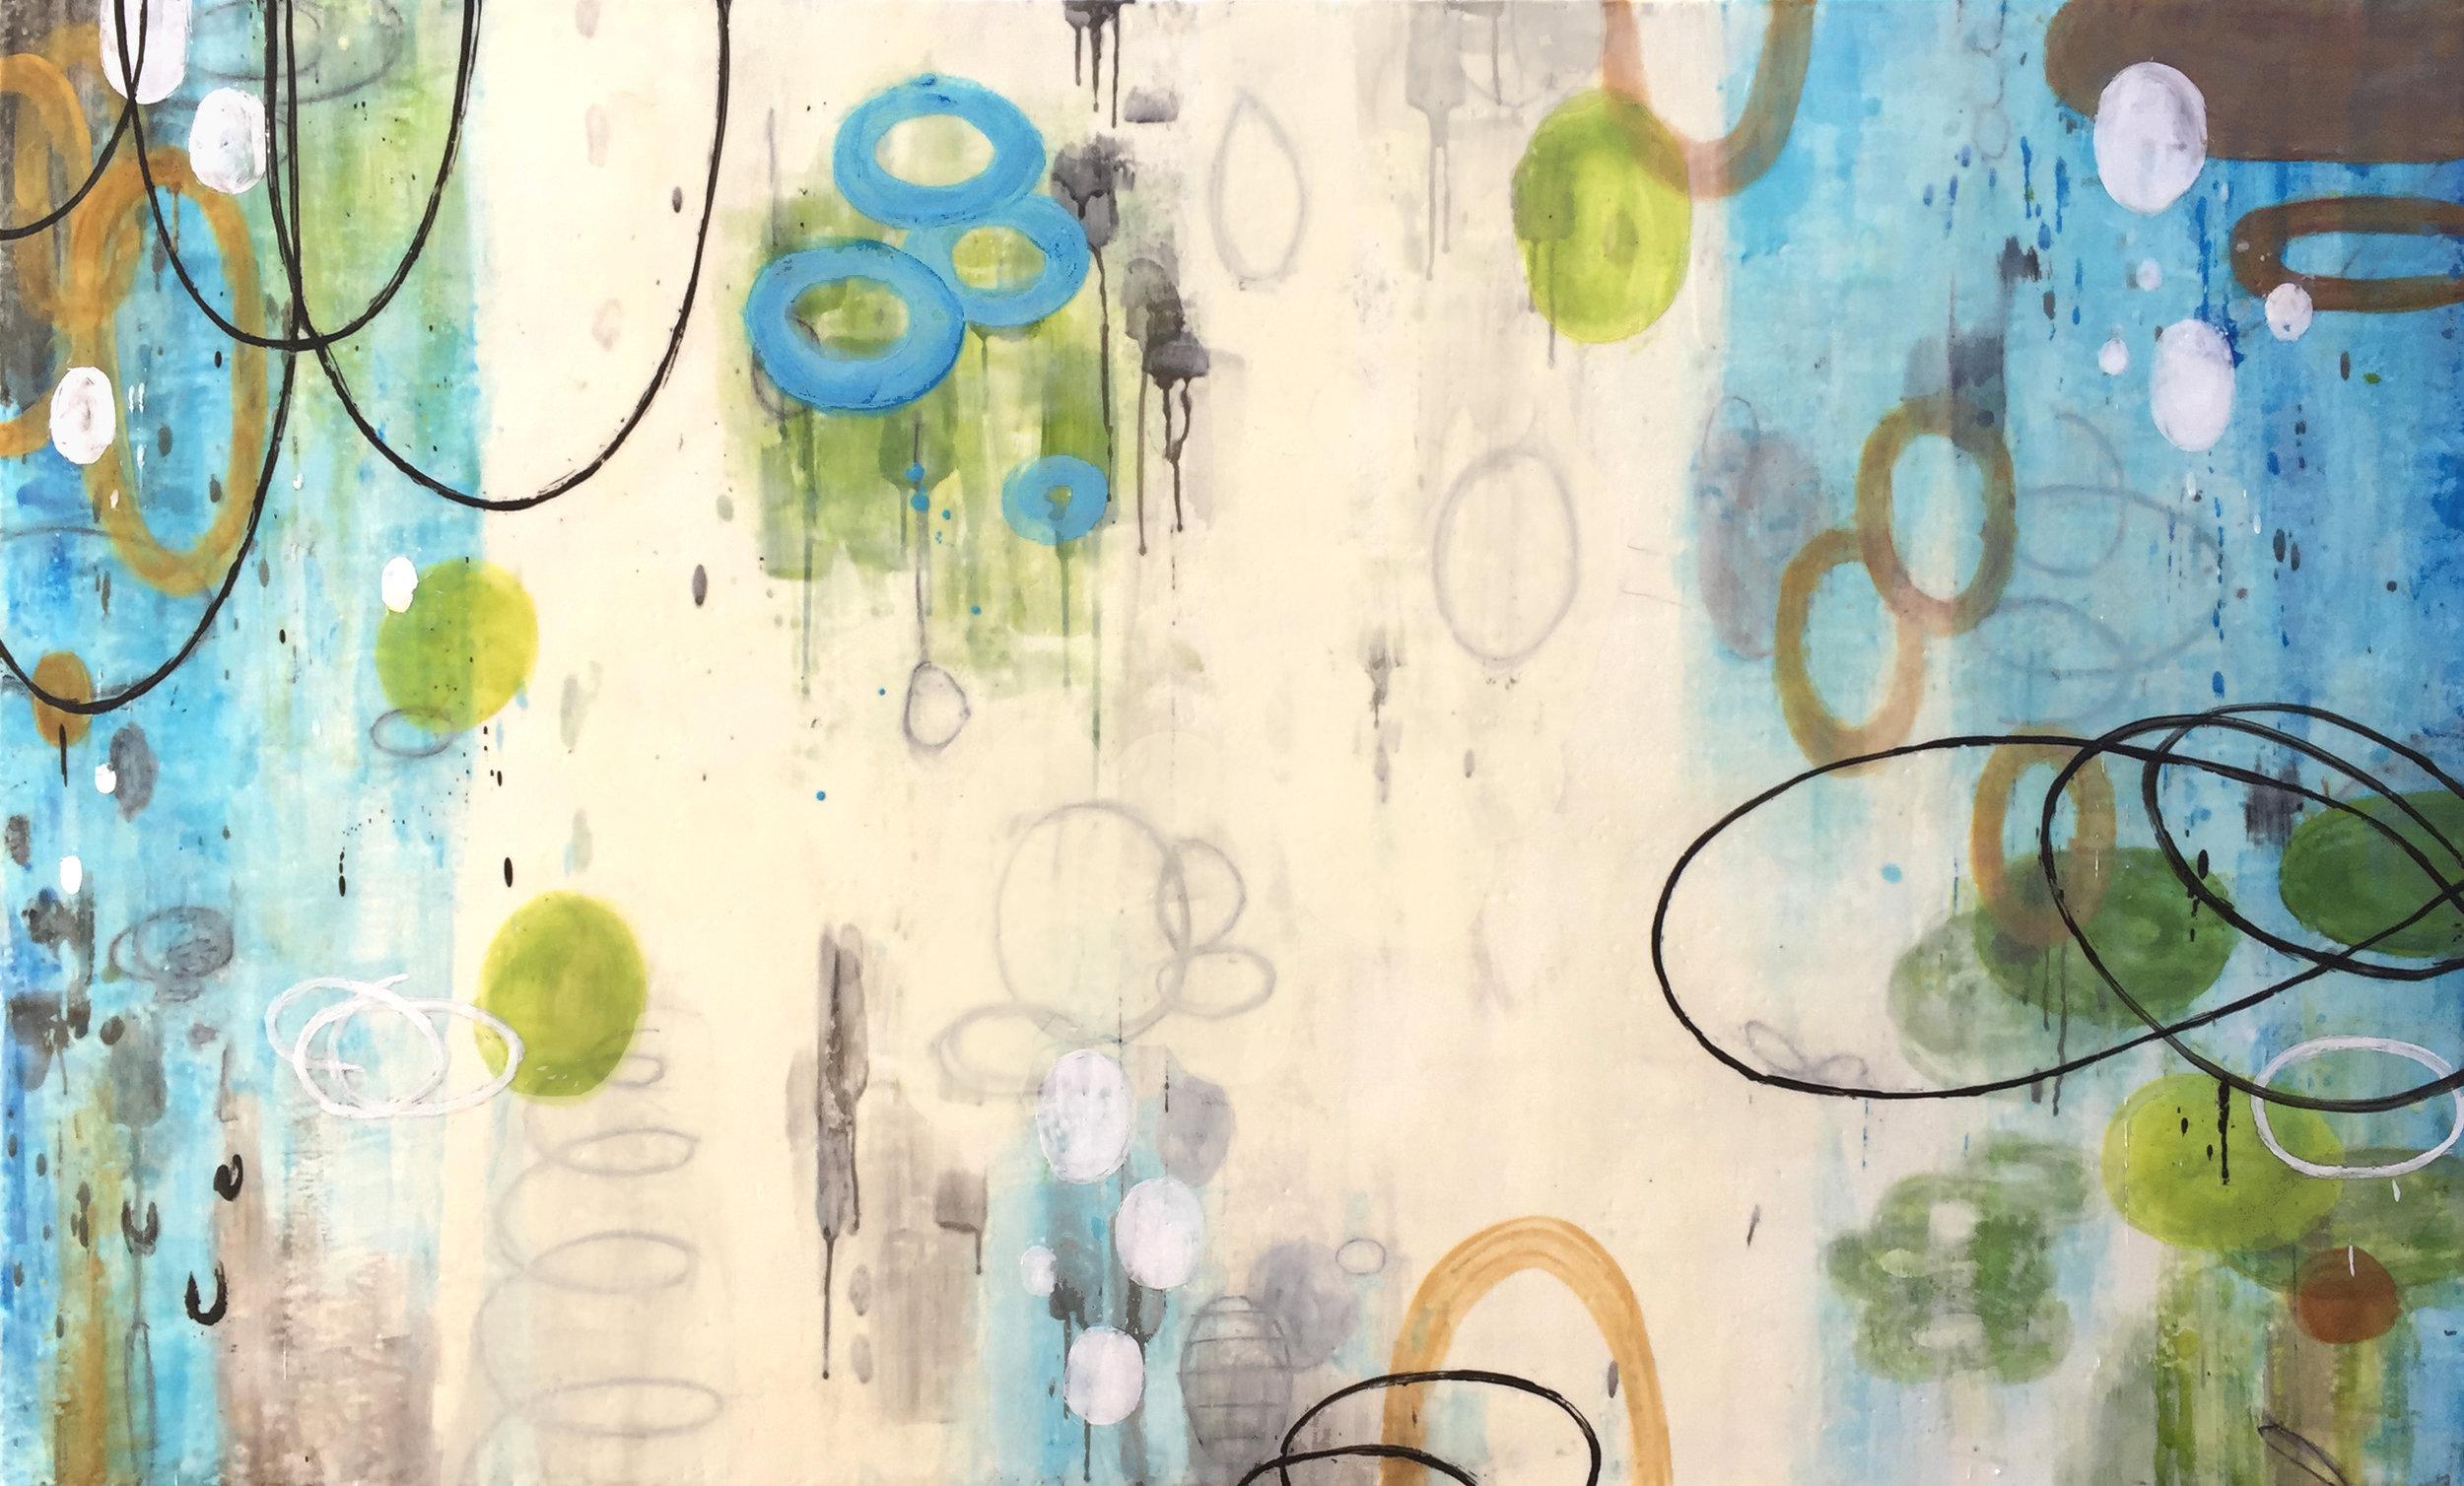 Untitled L866 (commission) 36x60 panel